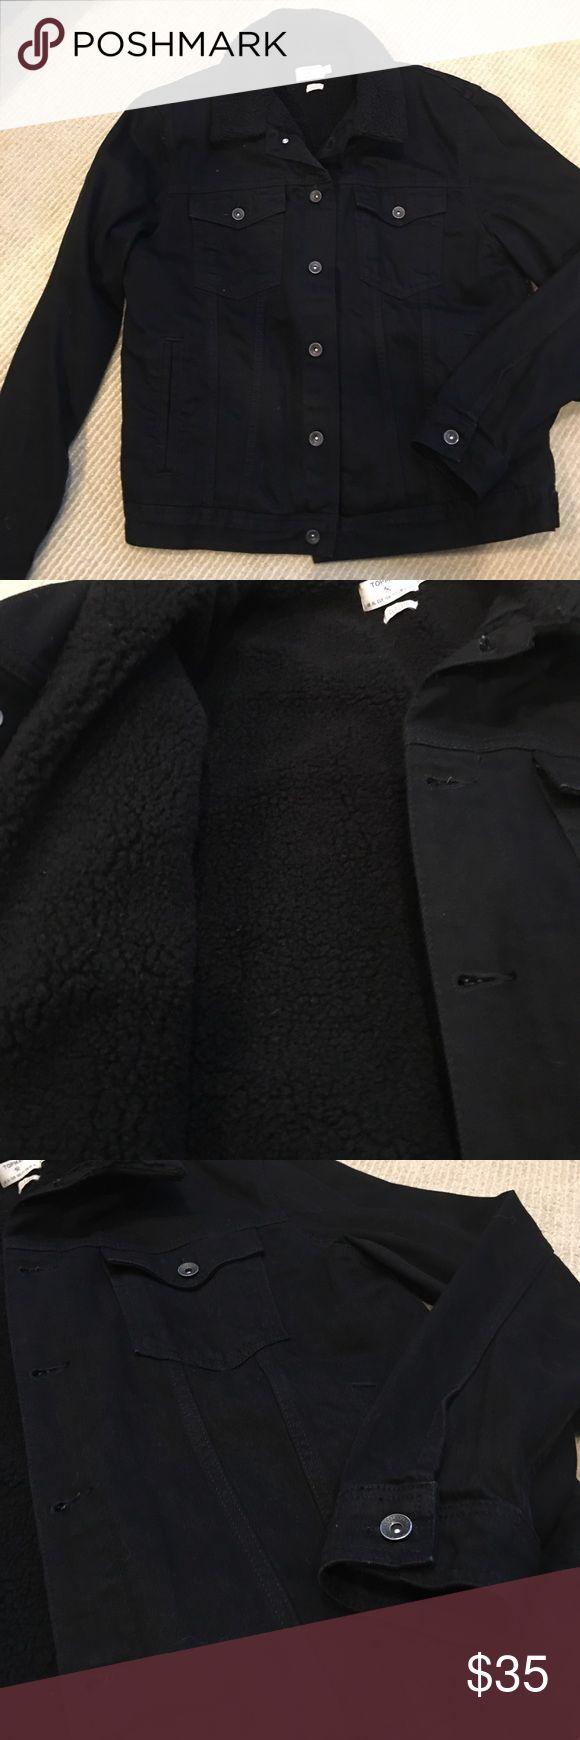 Men's Denim Lined Jacket Black Topman Classic Denim lined Jacket Topman Jackets & Coats Bomber & Varsity